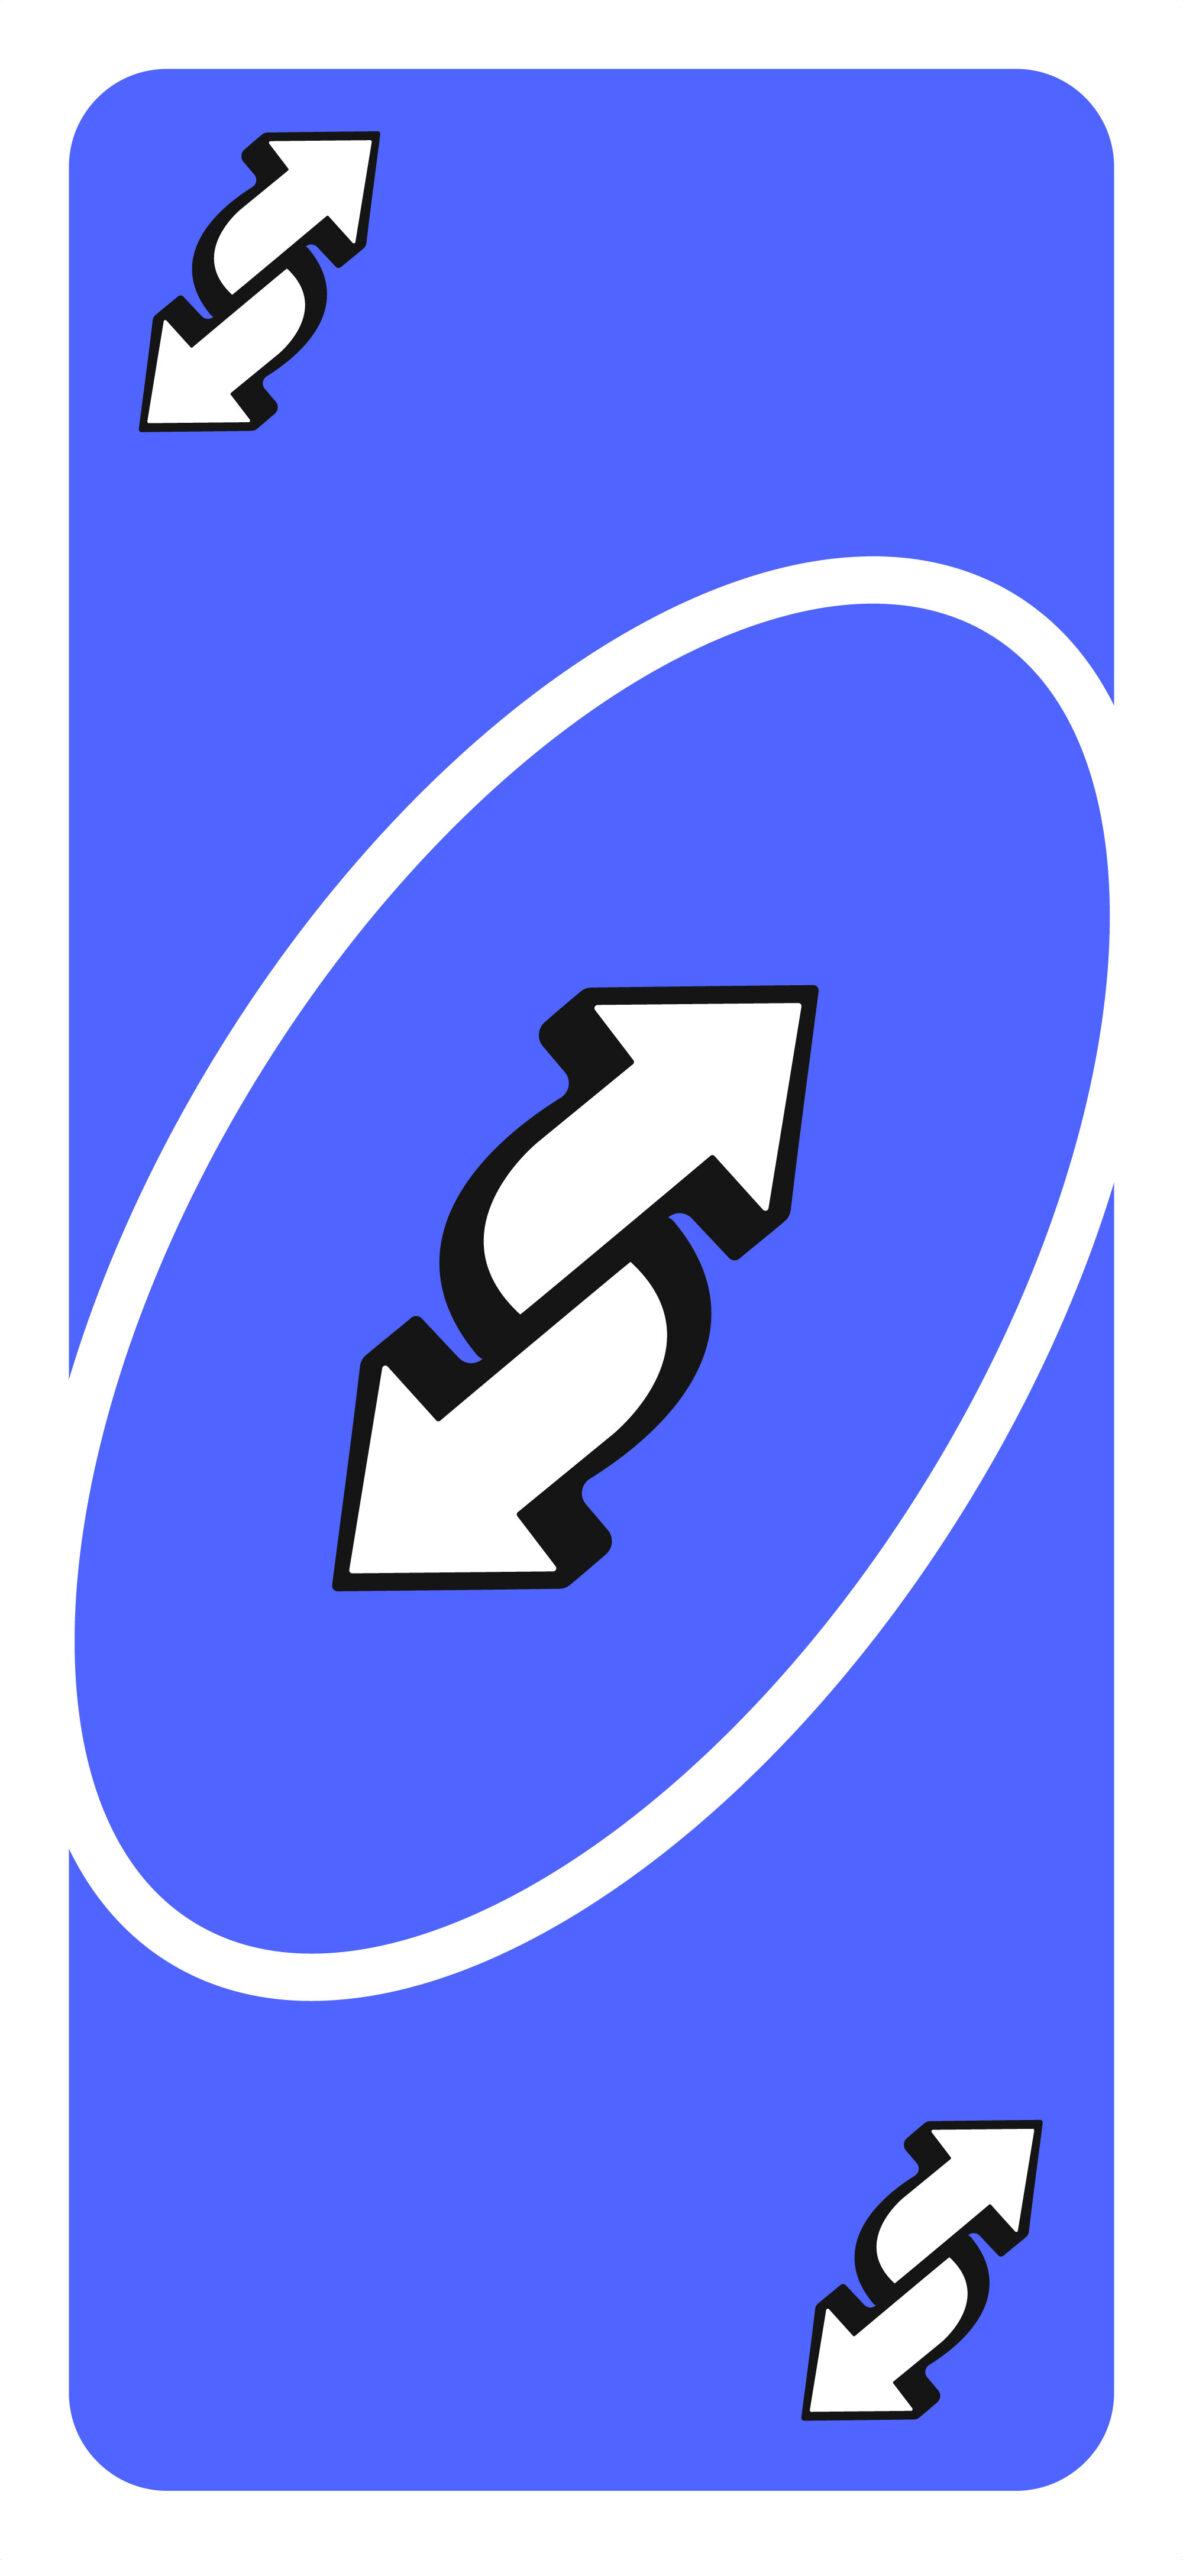 uno reverse card meme blue wallpaper